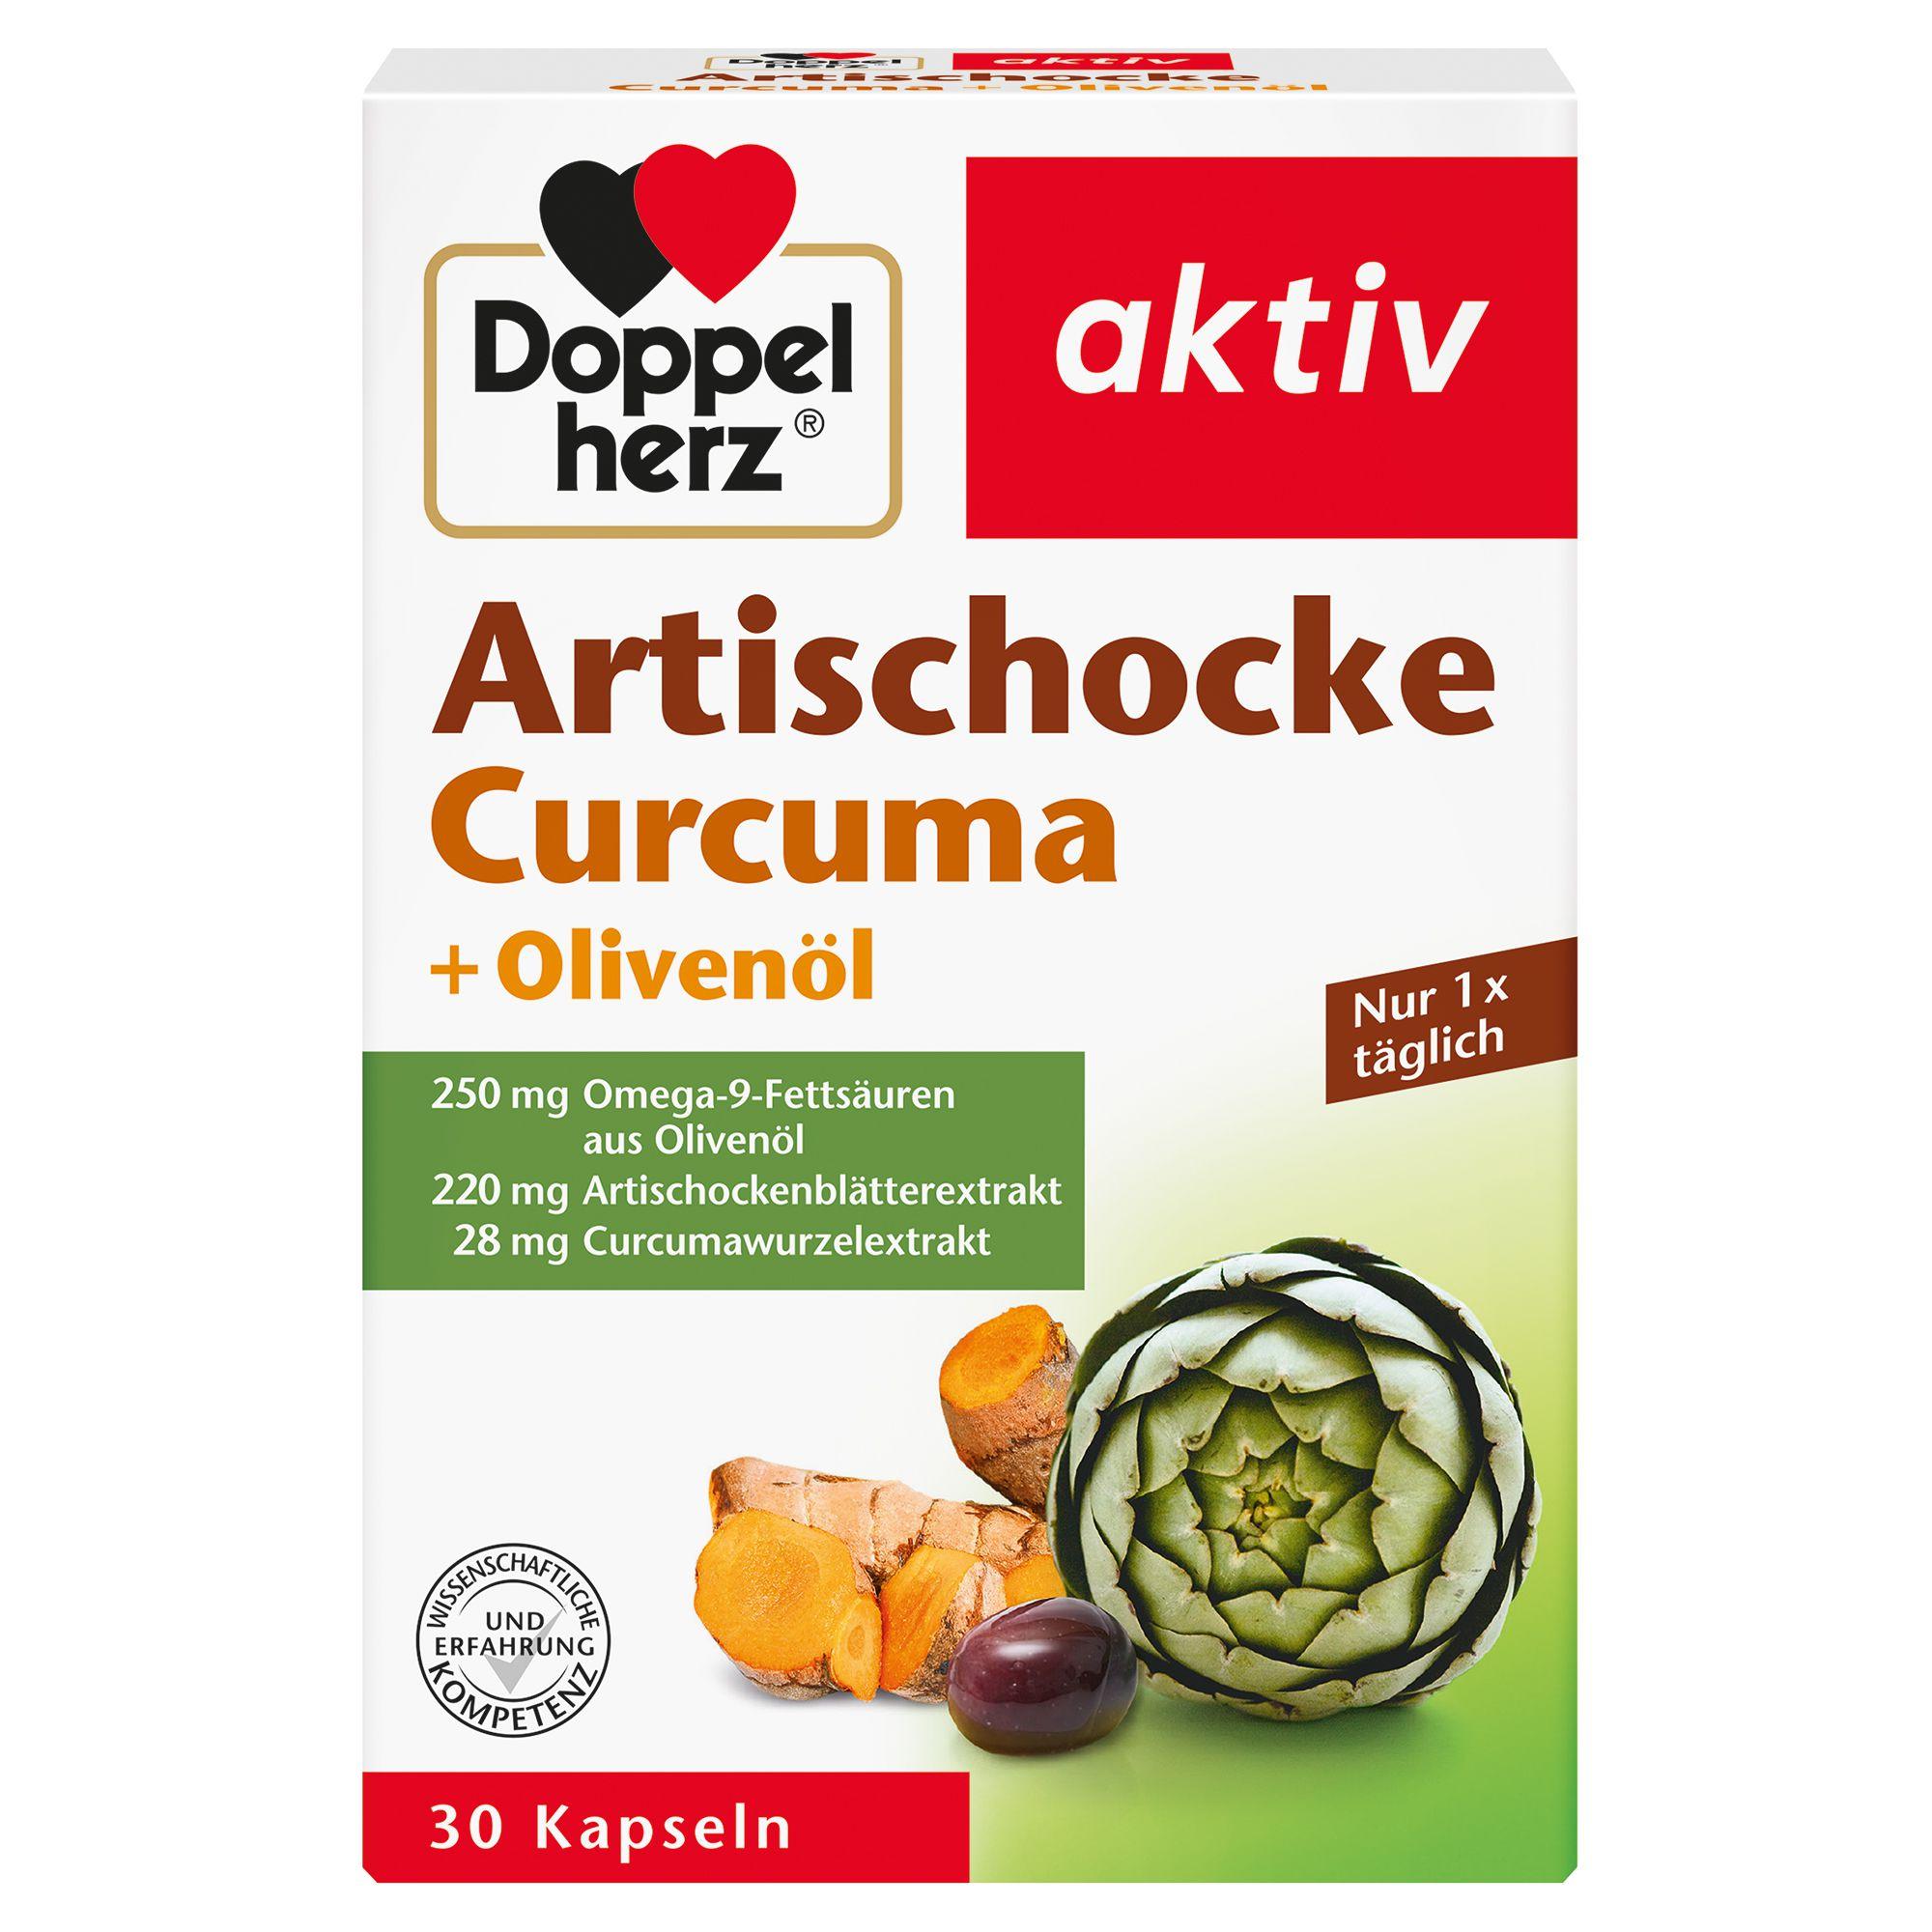 DOPPELHERZ Artischocke+Olivenöl+Curcuma Kapseln 30 St ...